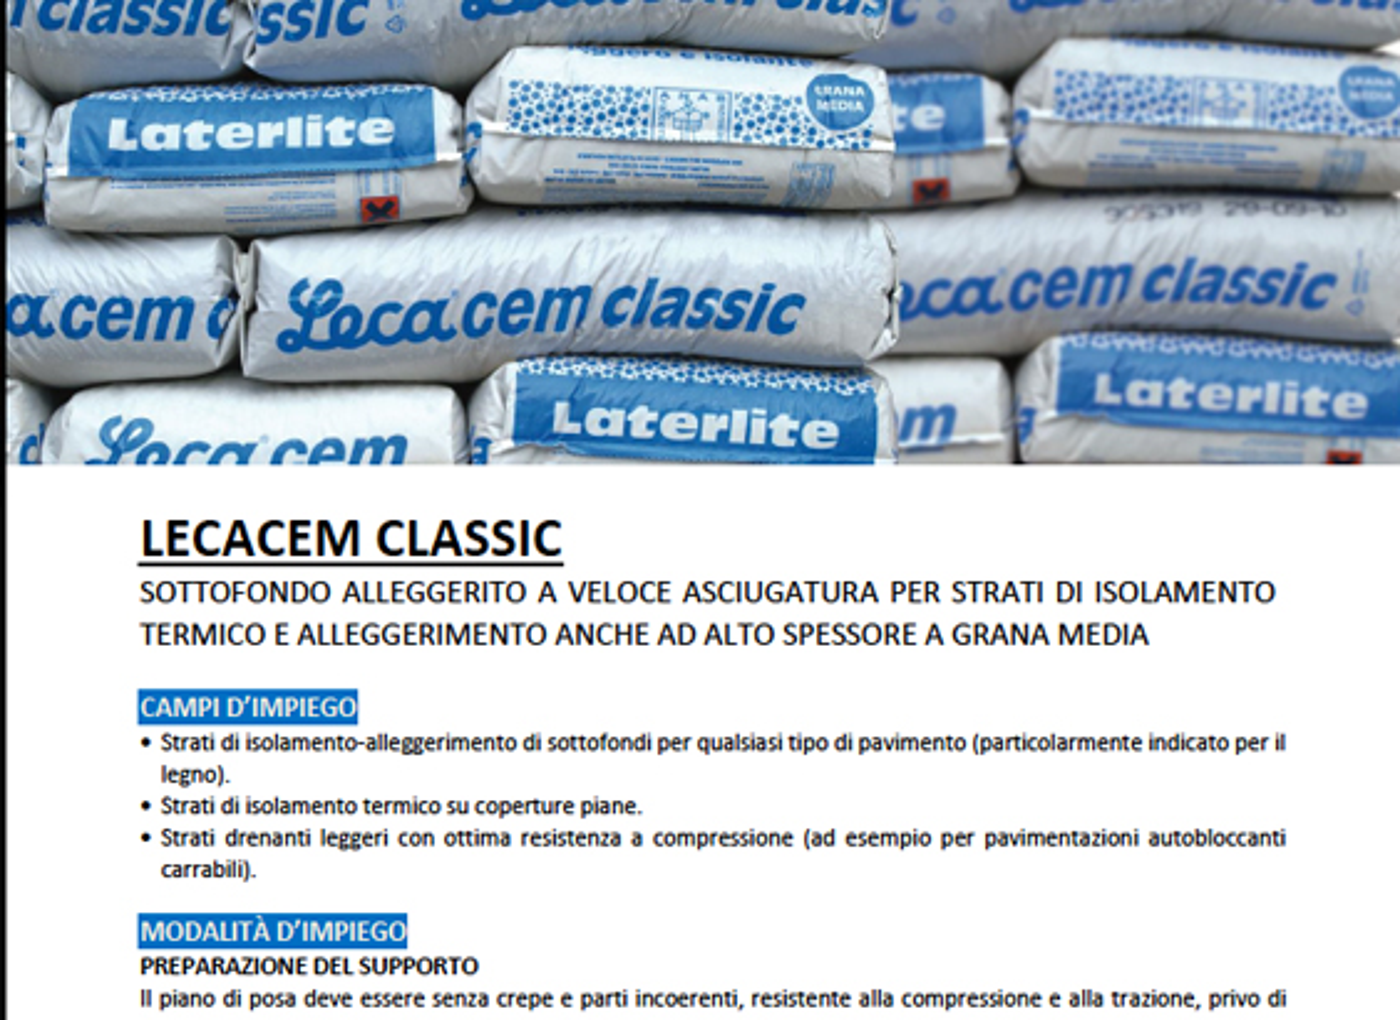 scheda-tecnica-lecacem-classic-P7